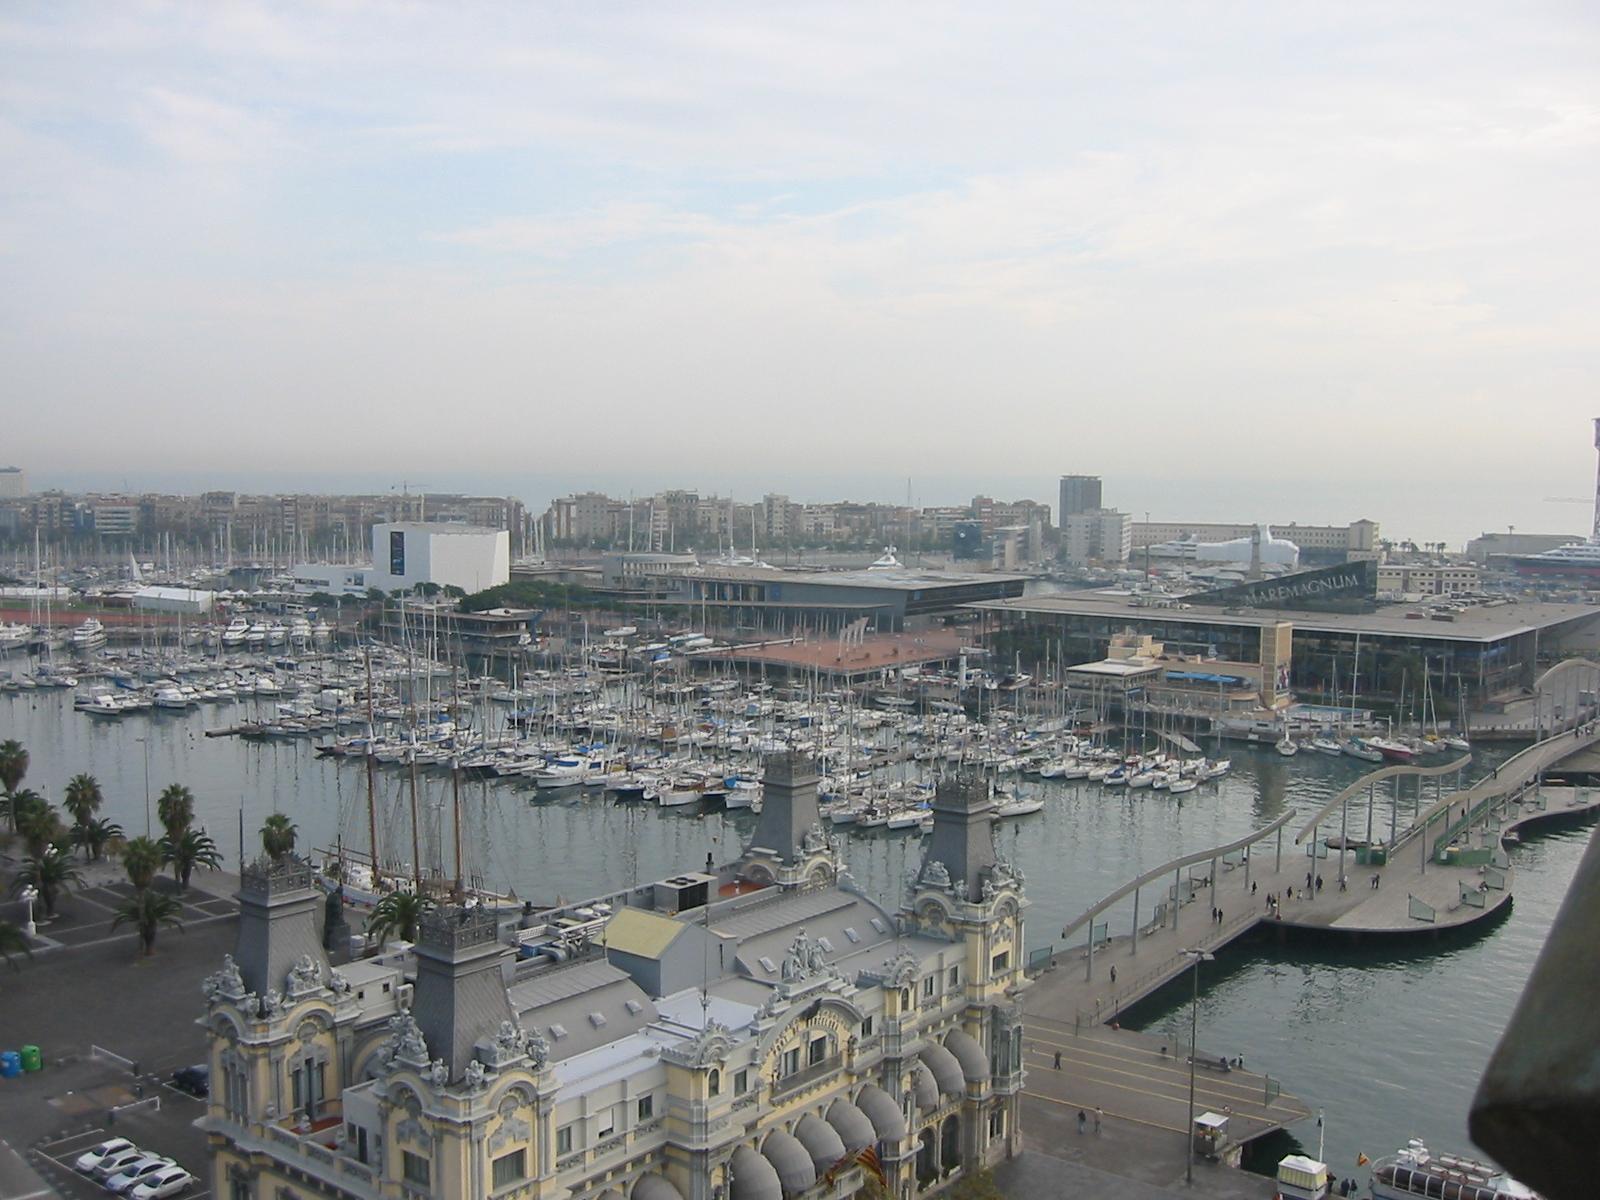 nature landscapes cityscapes marina yachts barca barcelona cityscape